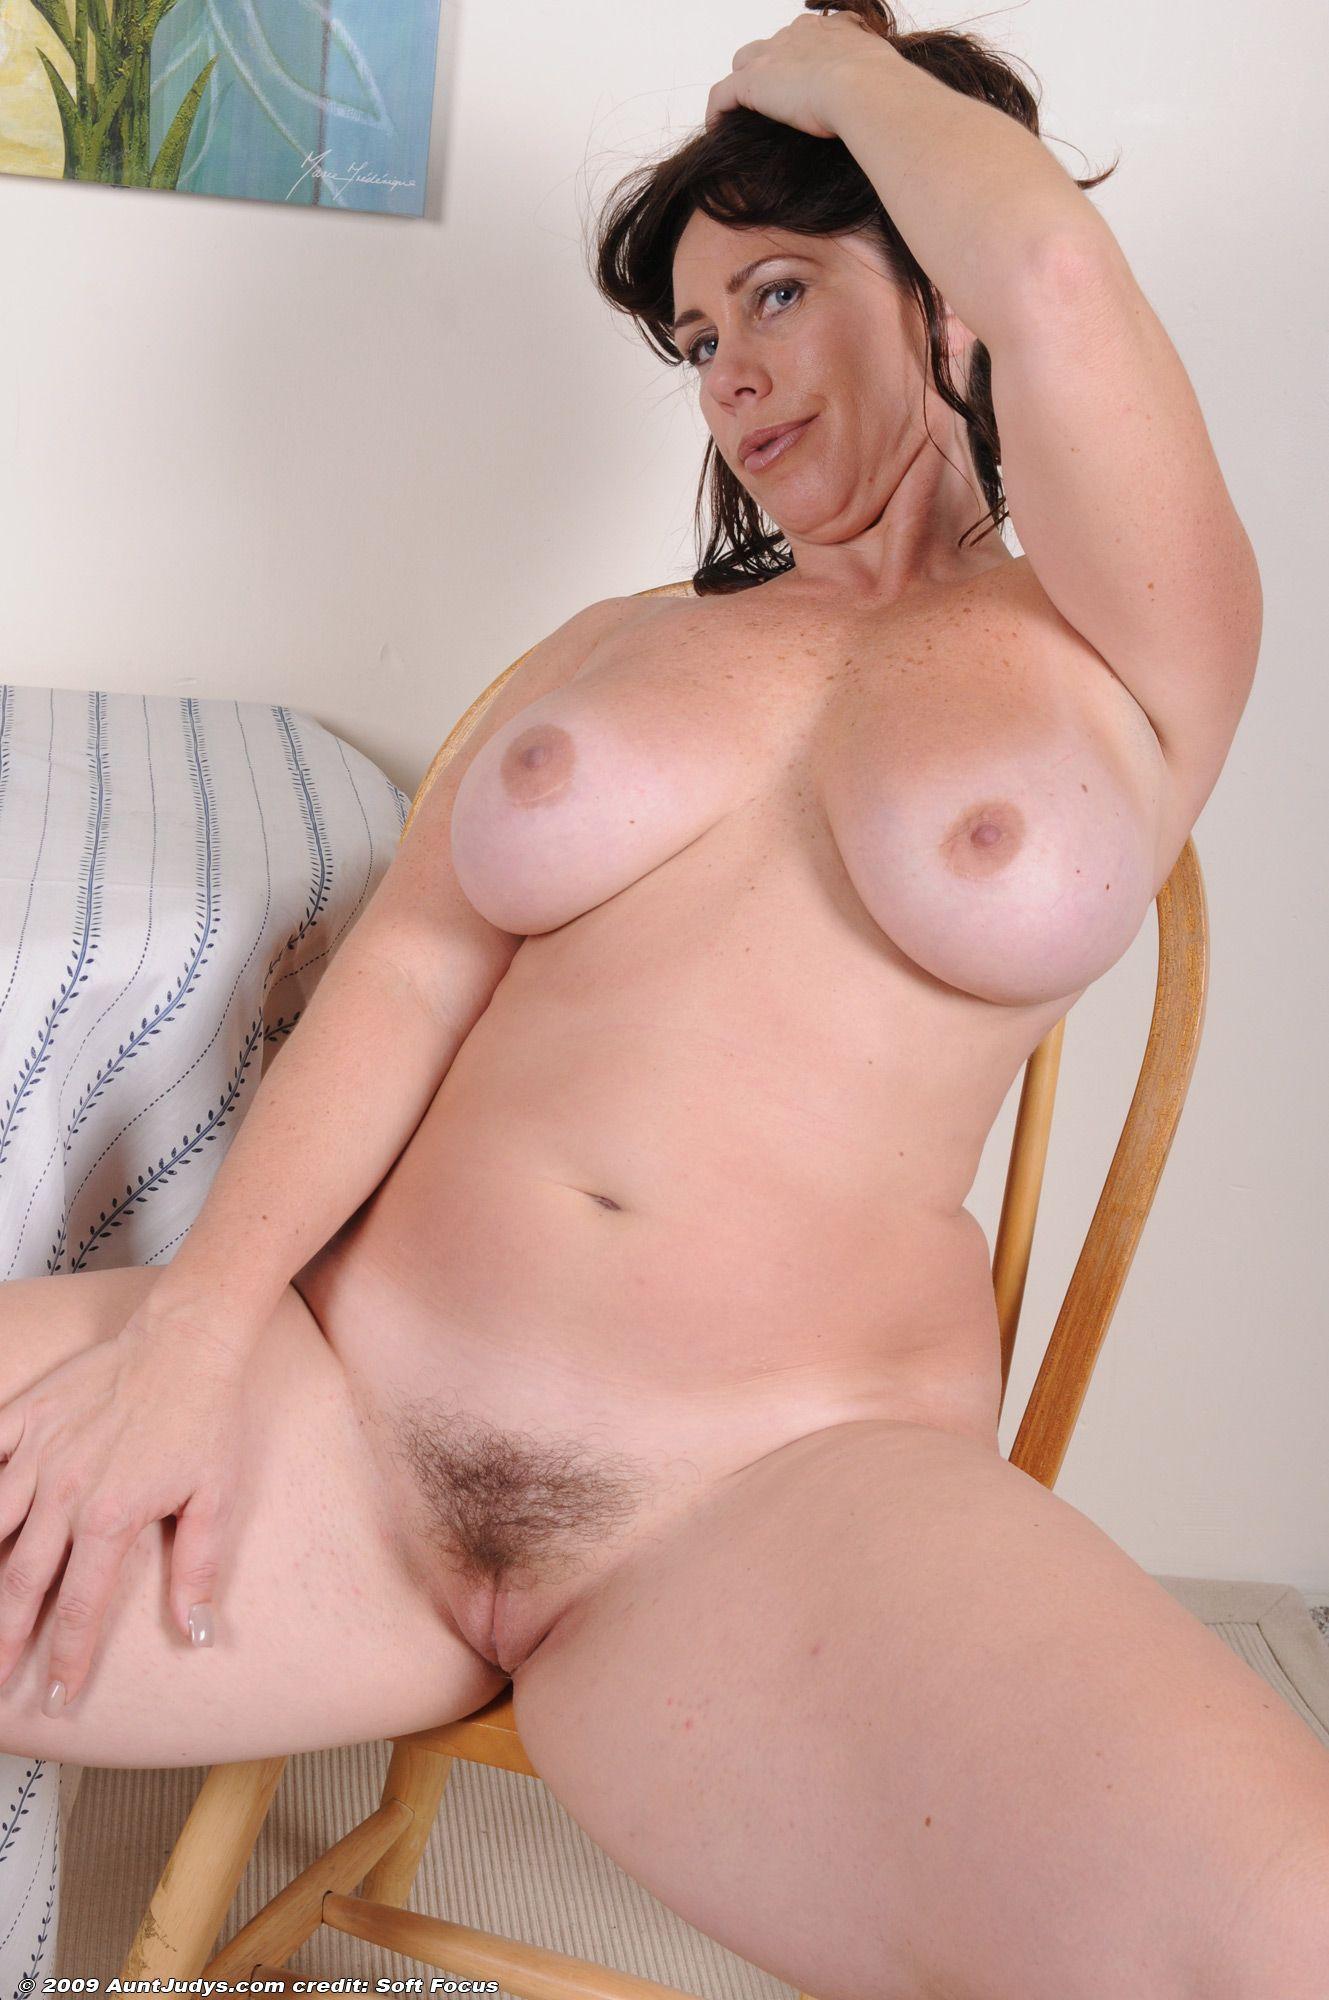 Bbw Porn Magazine nude chubby auntjudys hot xxx free compilations.